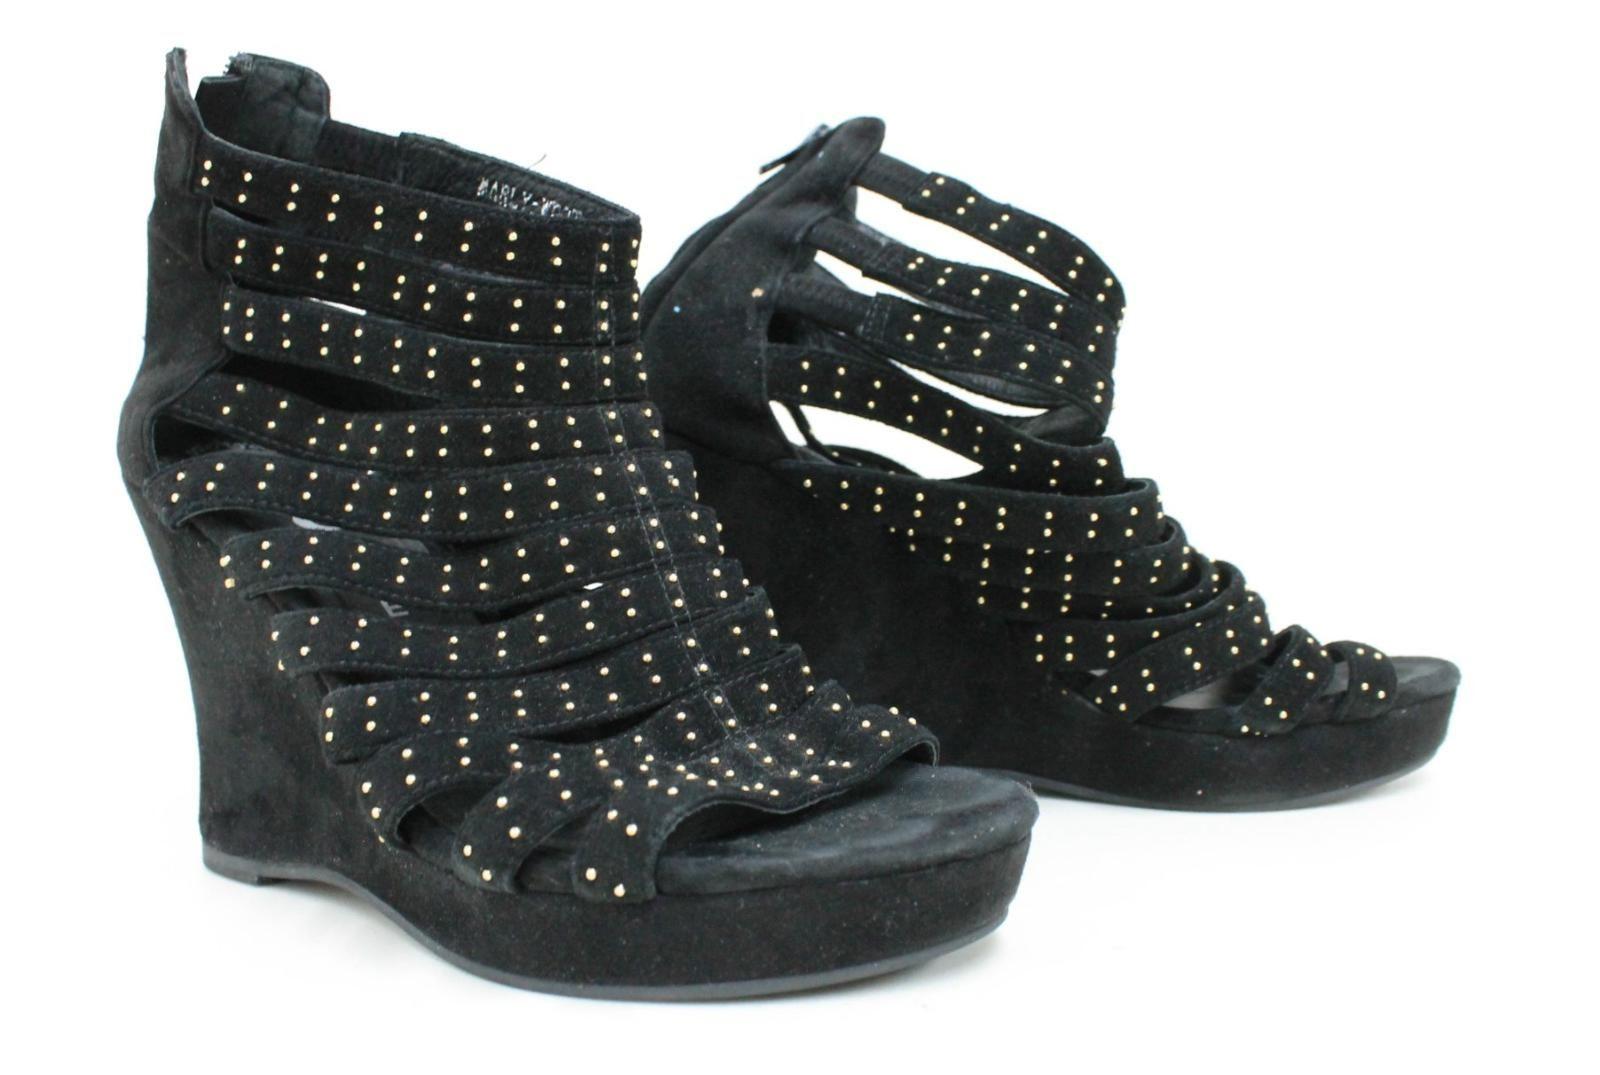 JEFFERY-CAMPBELL-Marly-Ladies-Black-Suede-Studded-Gladiator-Wedge-Sandals-UK7-5